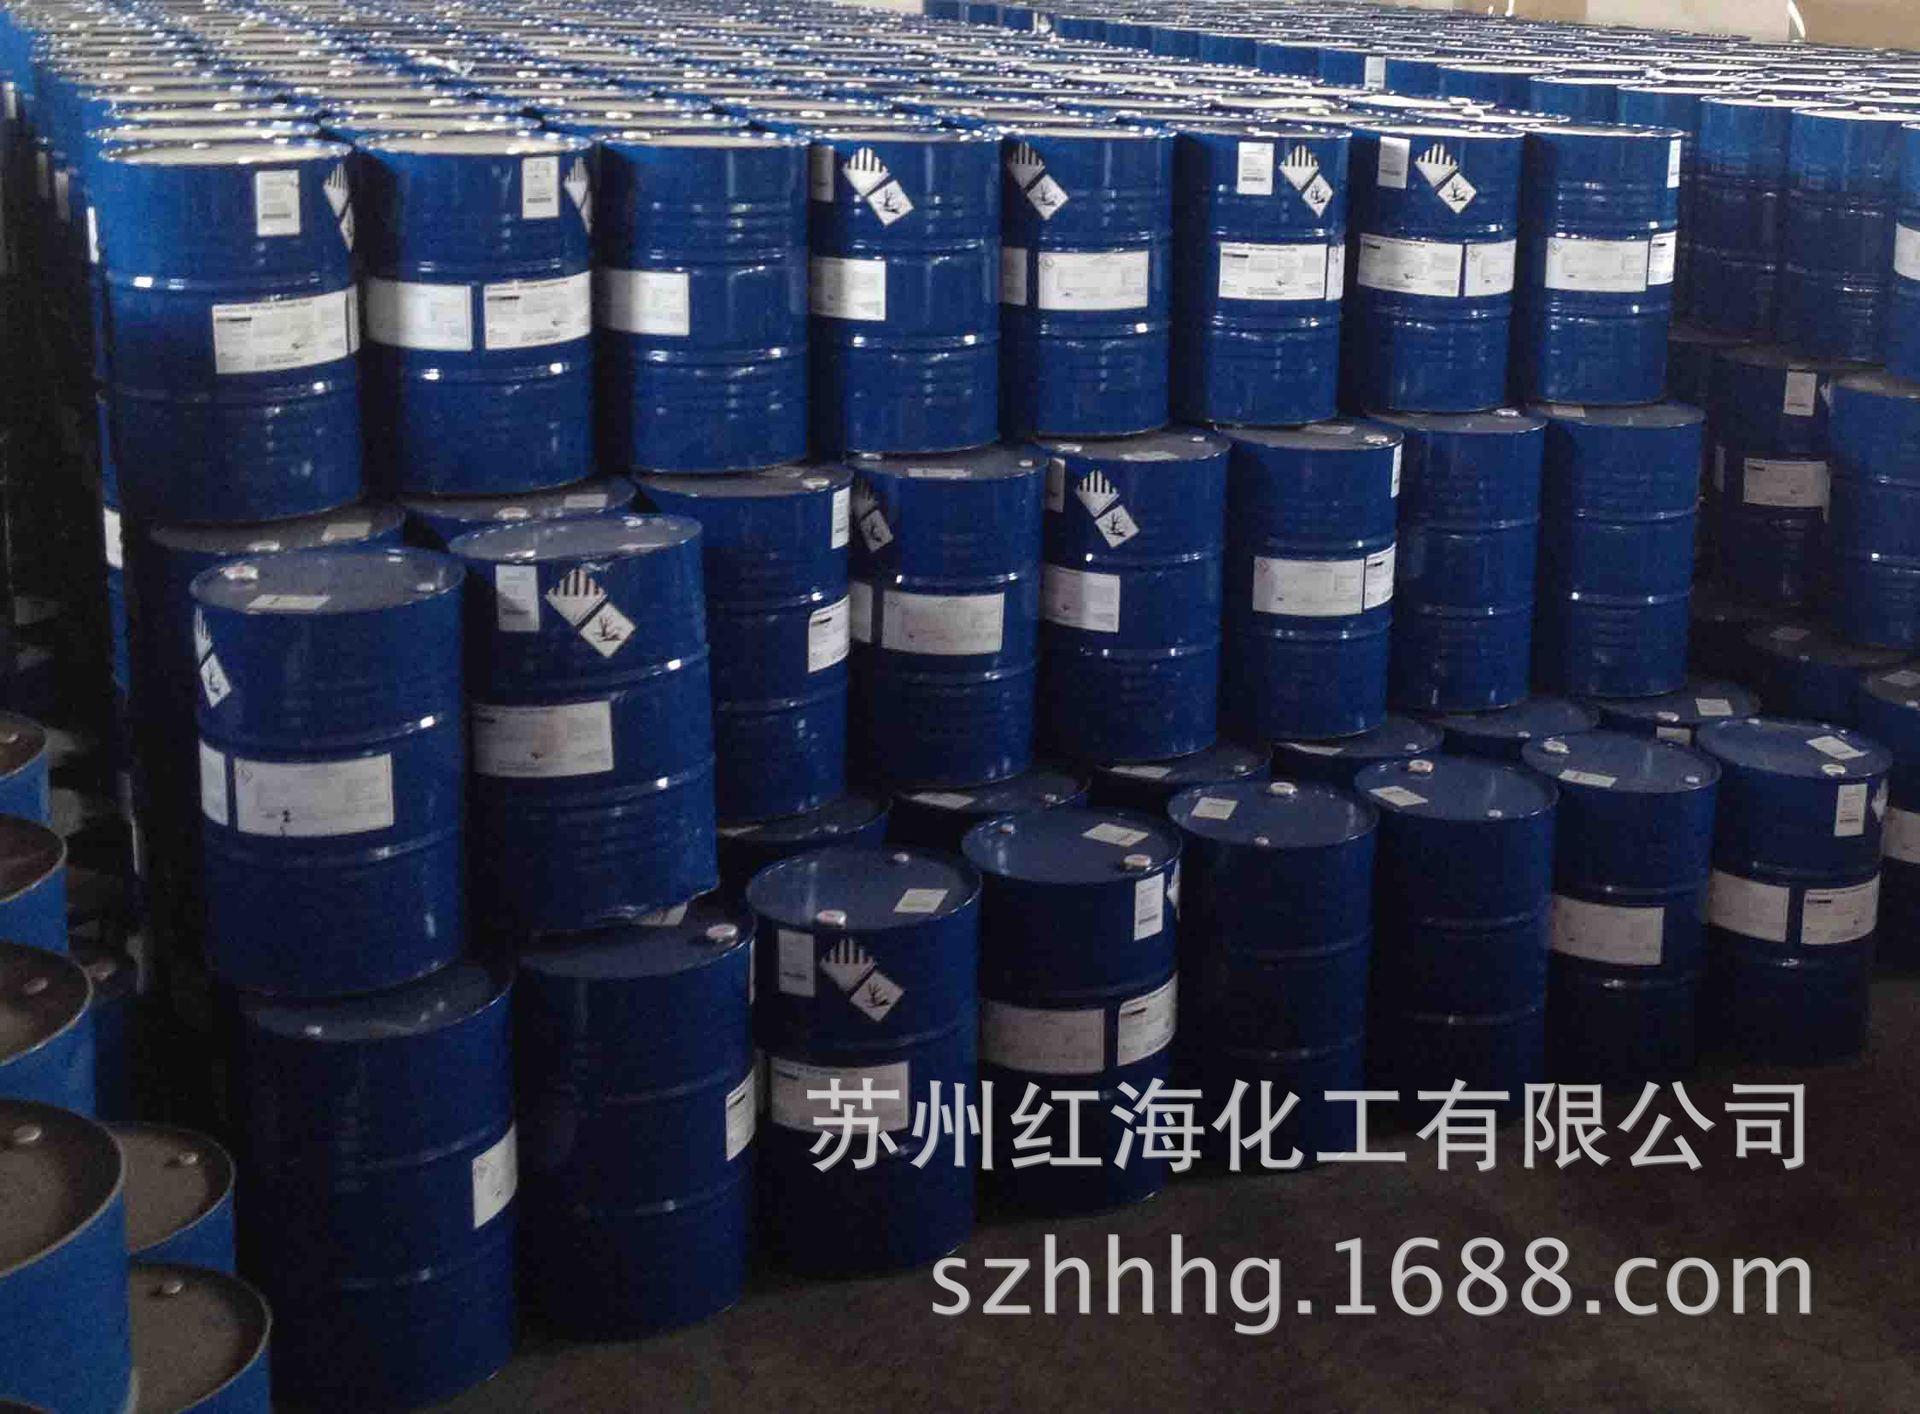 DOW陶氏化学合成润滑油UCON 50-HB-660